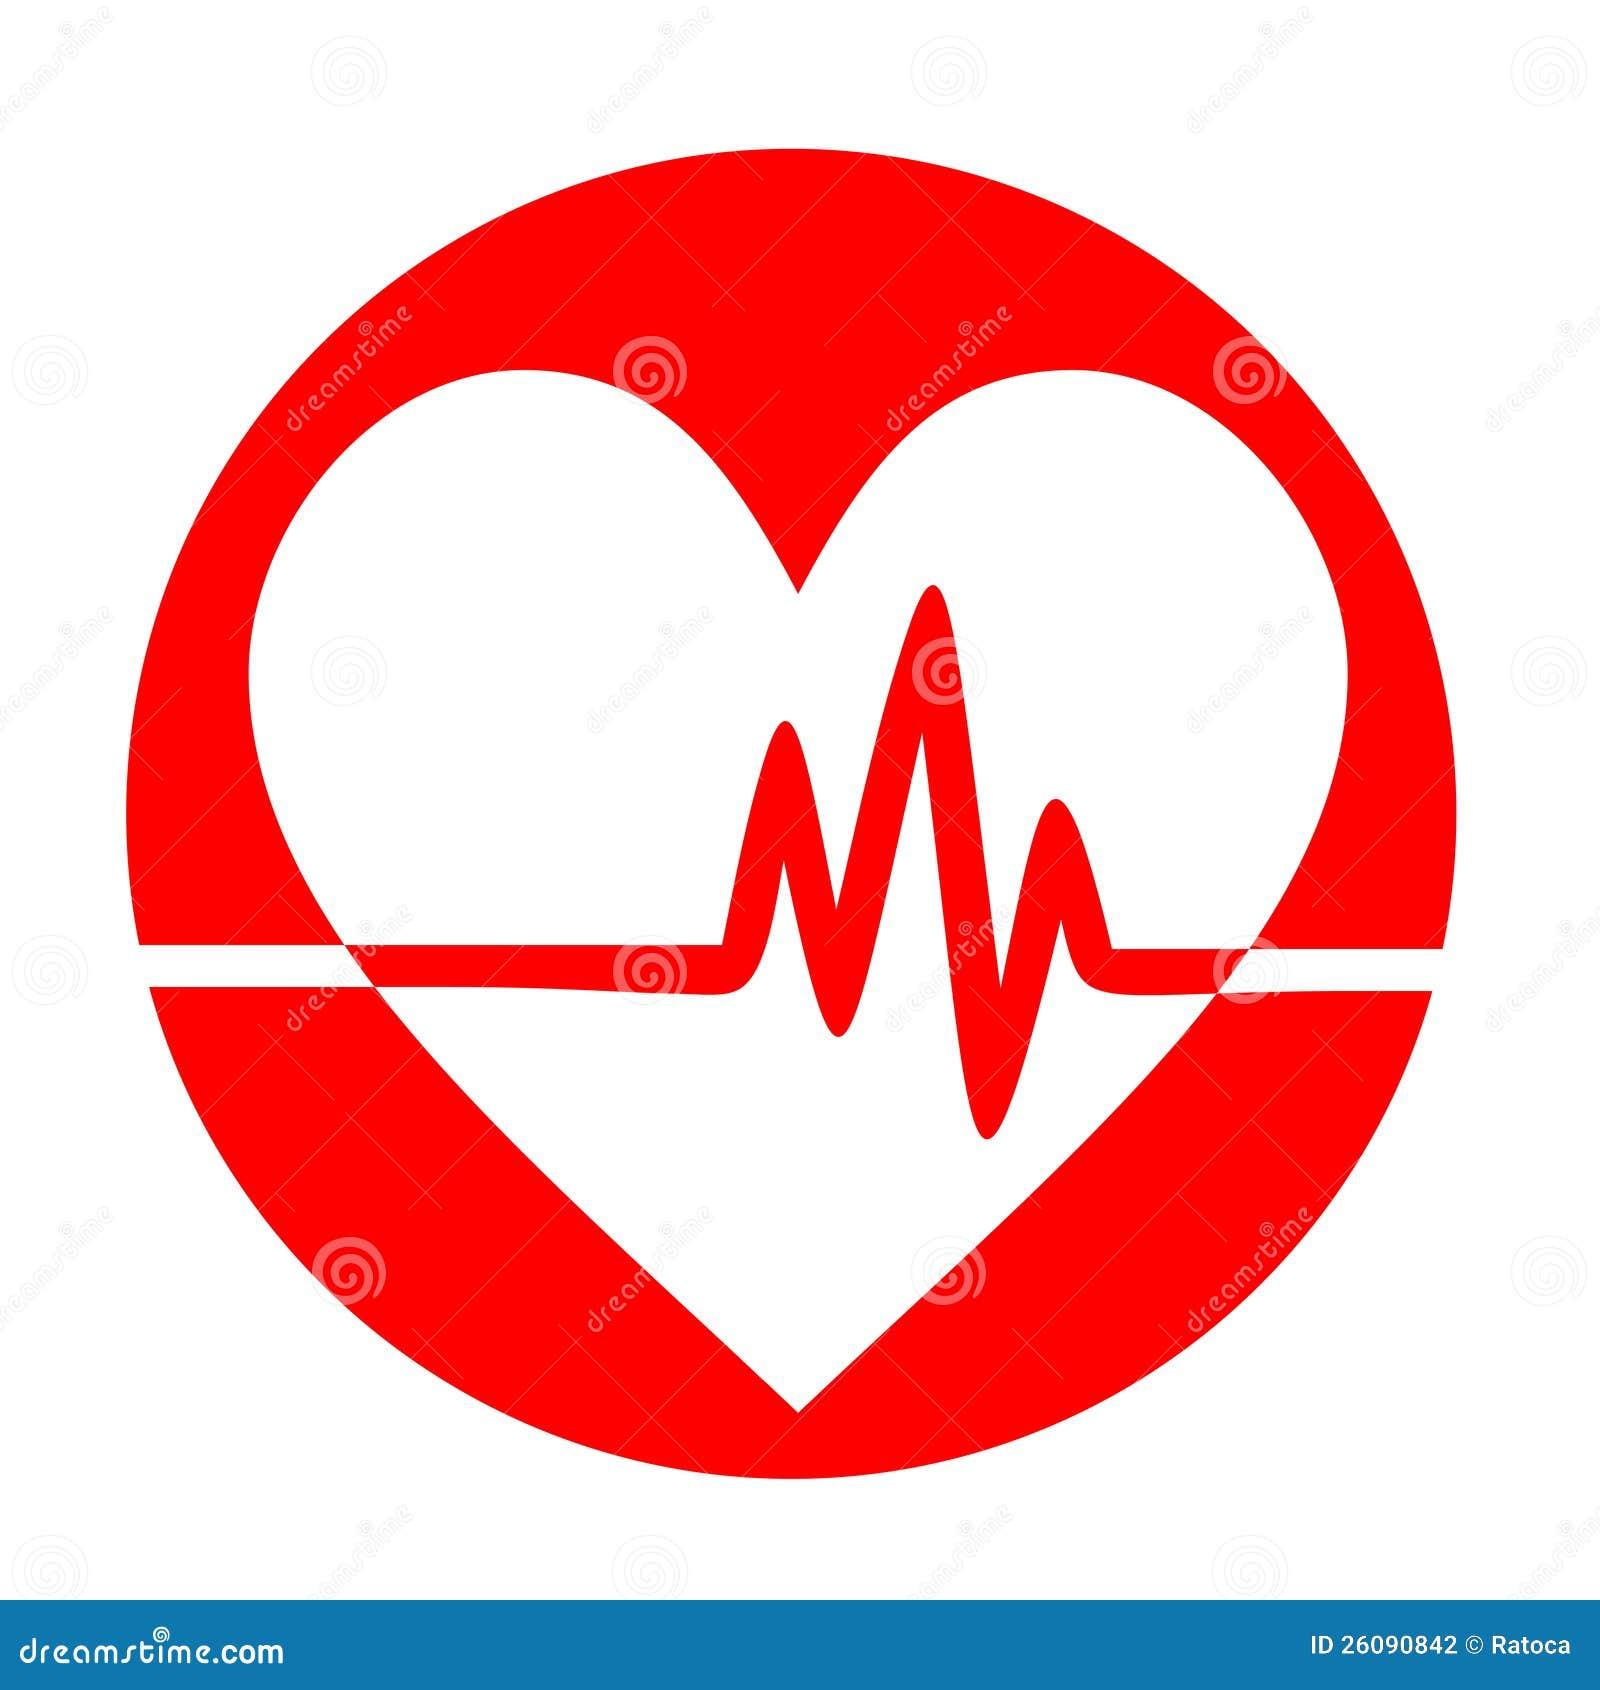 Medical Sign Stock Photography - Image: 26090842 Nursing Symbol Design